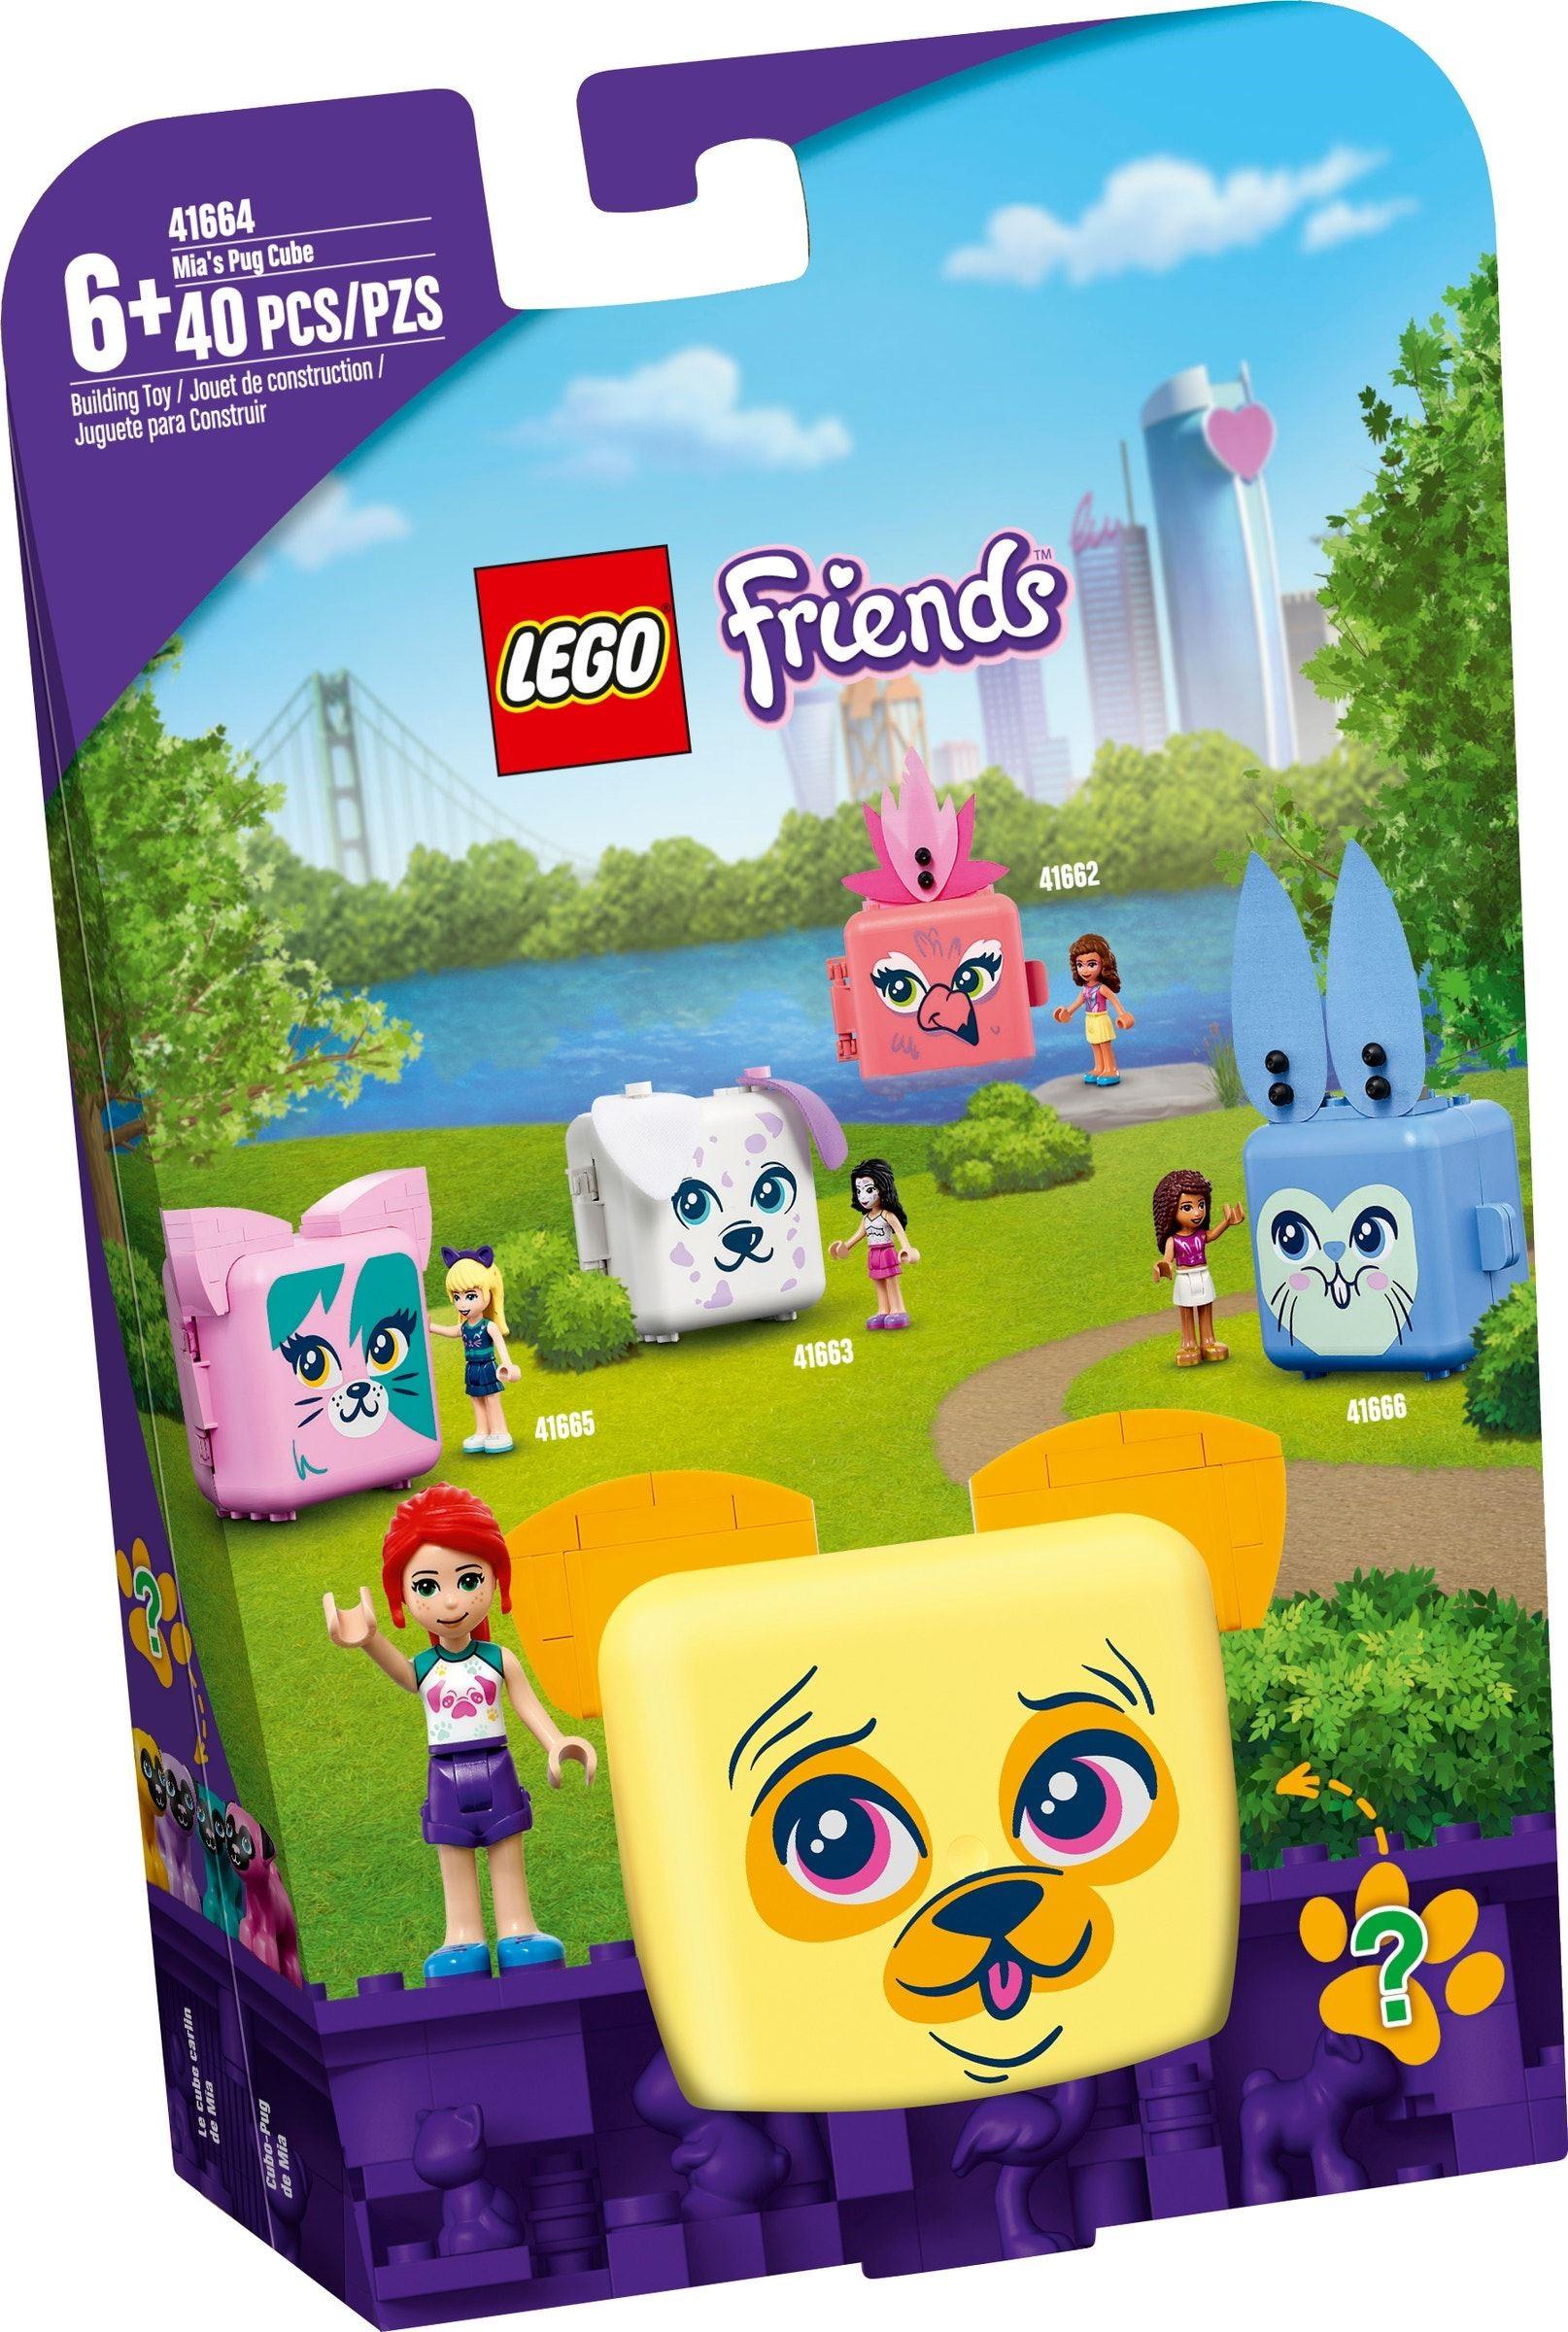 LEGO Friends - Mia's Pug Cube (41664)